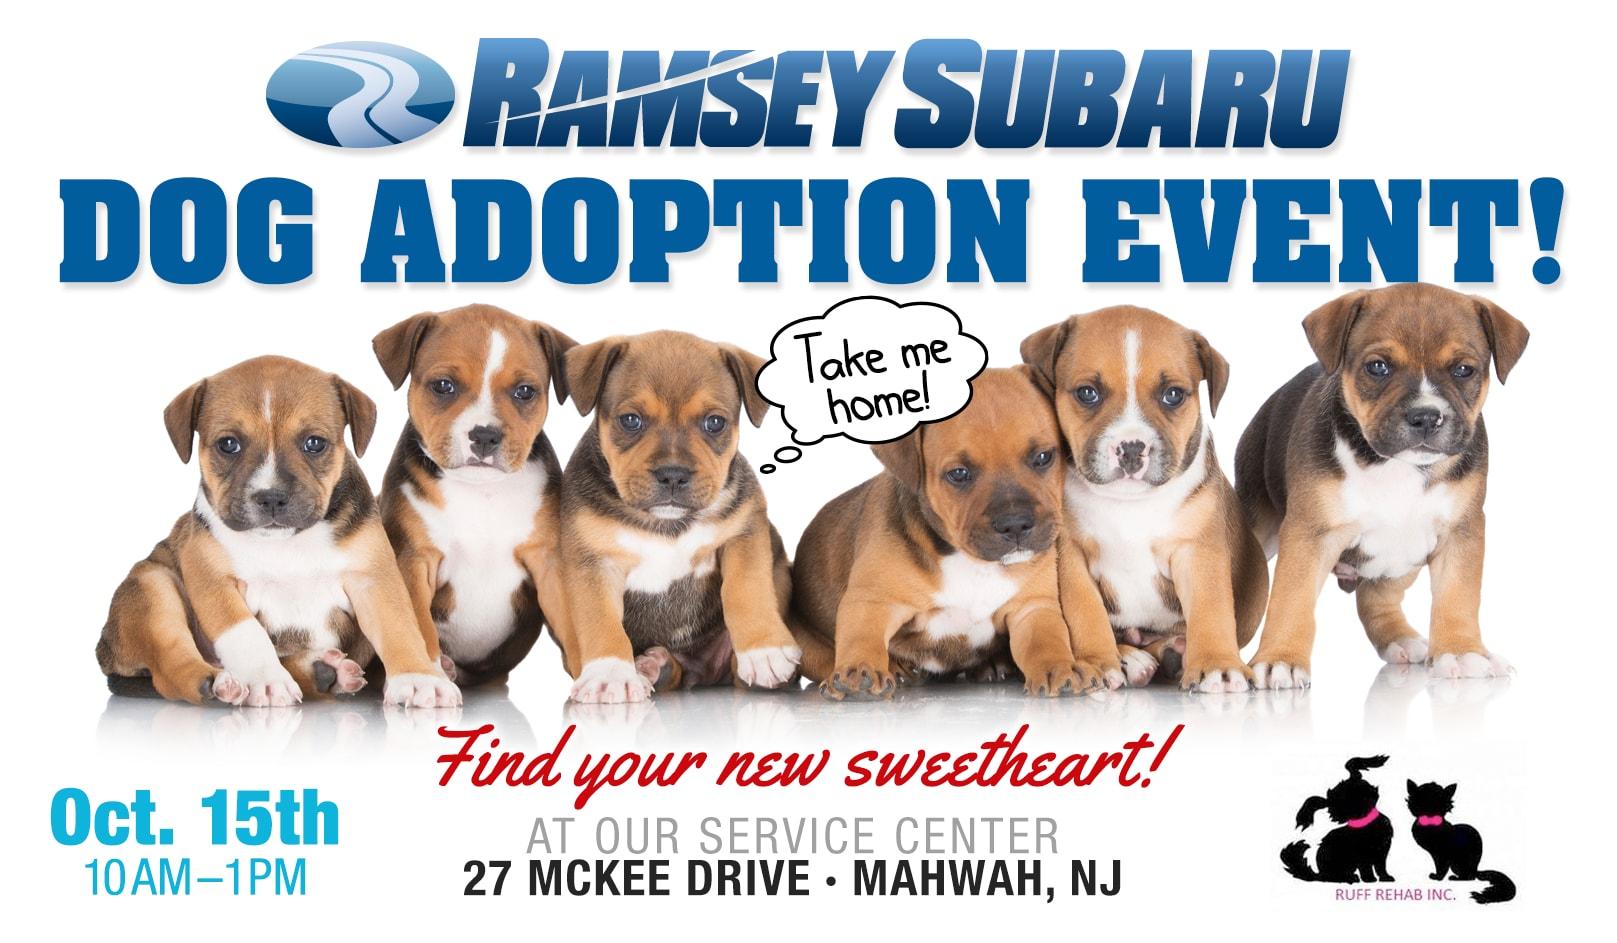 Ruff Rehab Dog Adoption Event